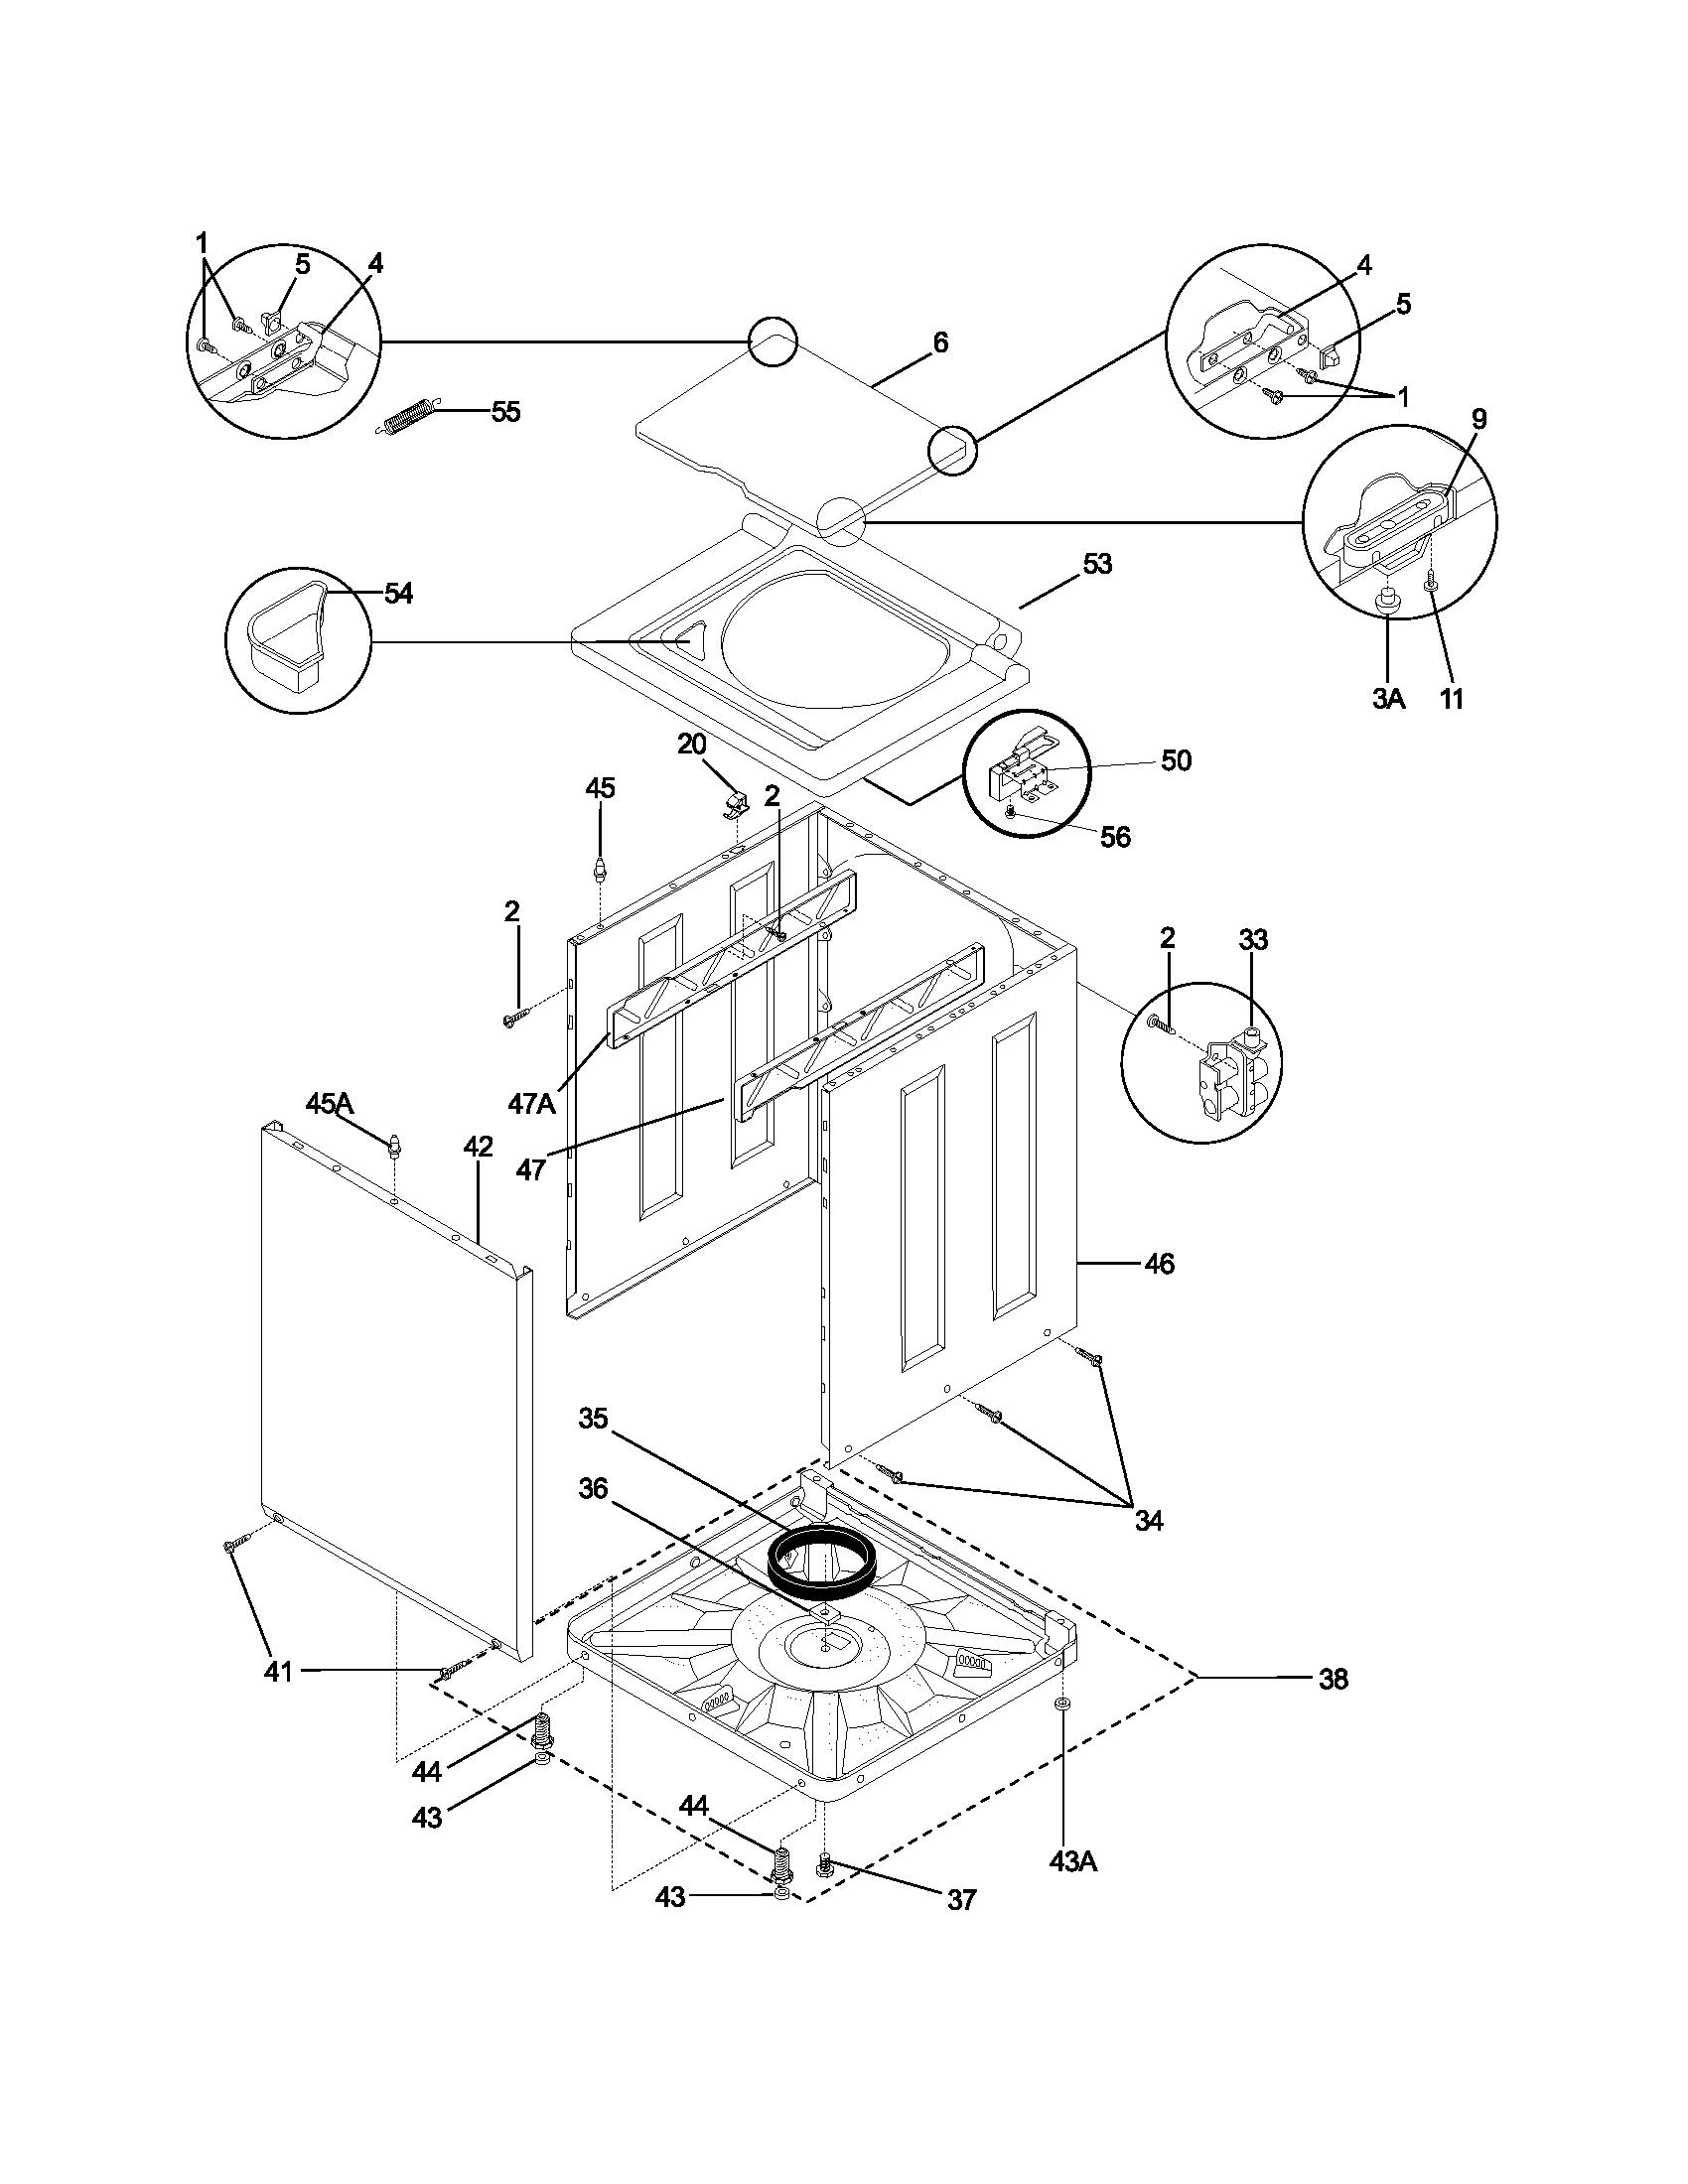 wiring diagram for frigidaire model fgx831fs0 washer dryer bo GlowShift Fuel Pressure Gauge Wiring